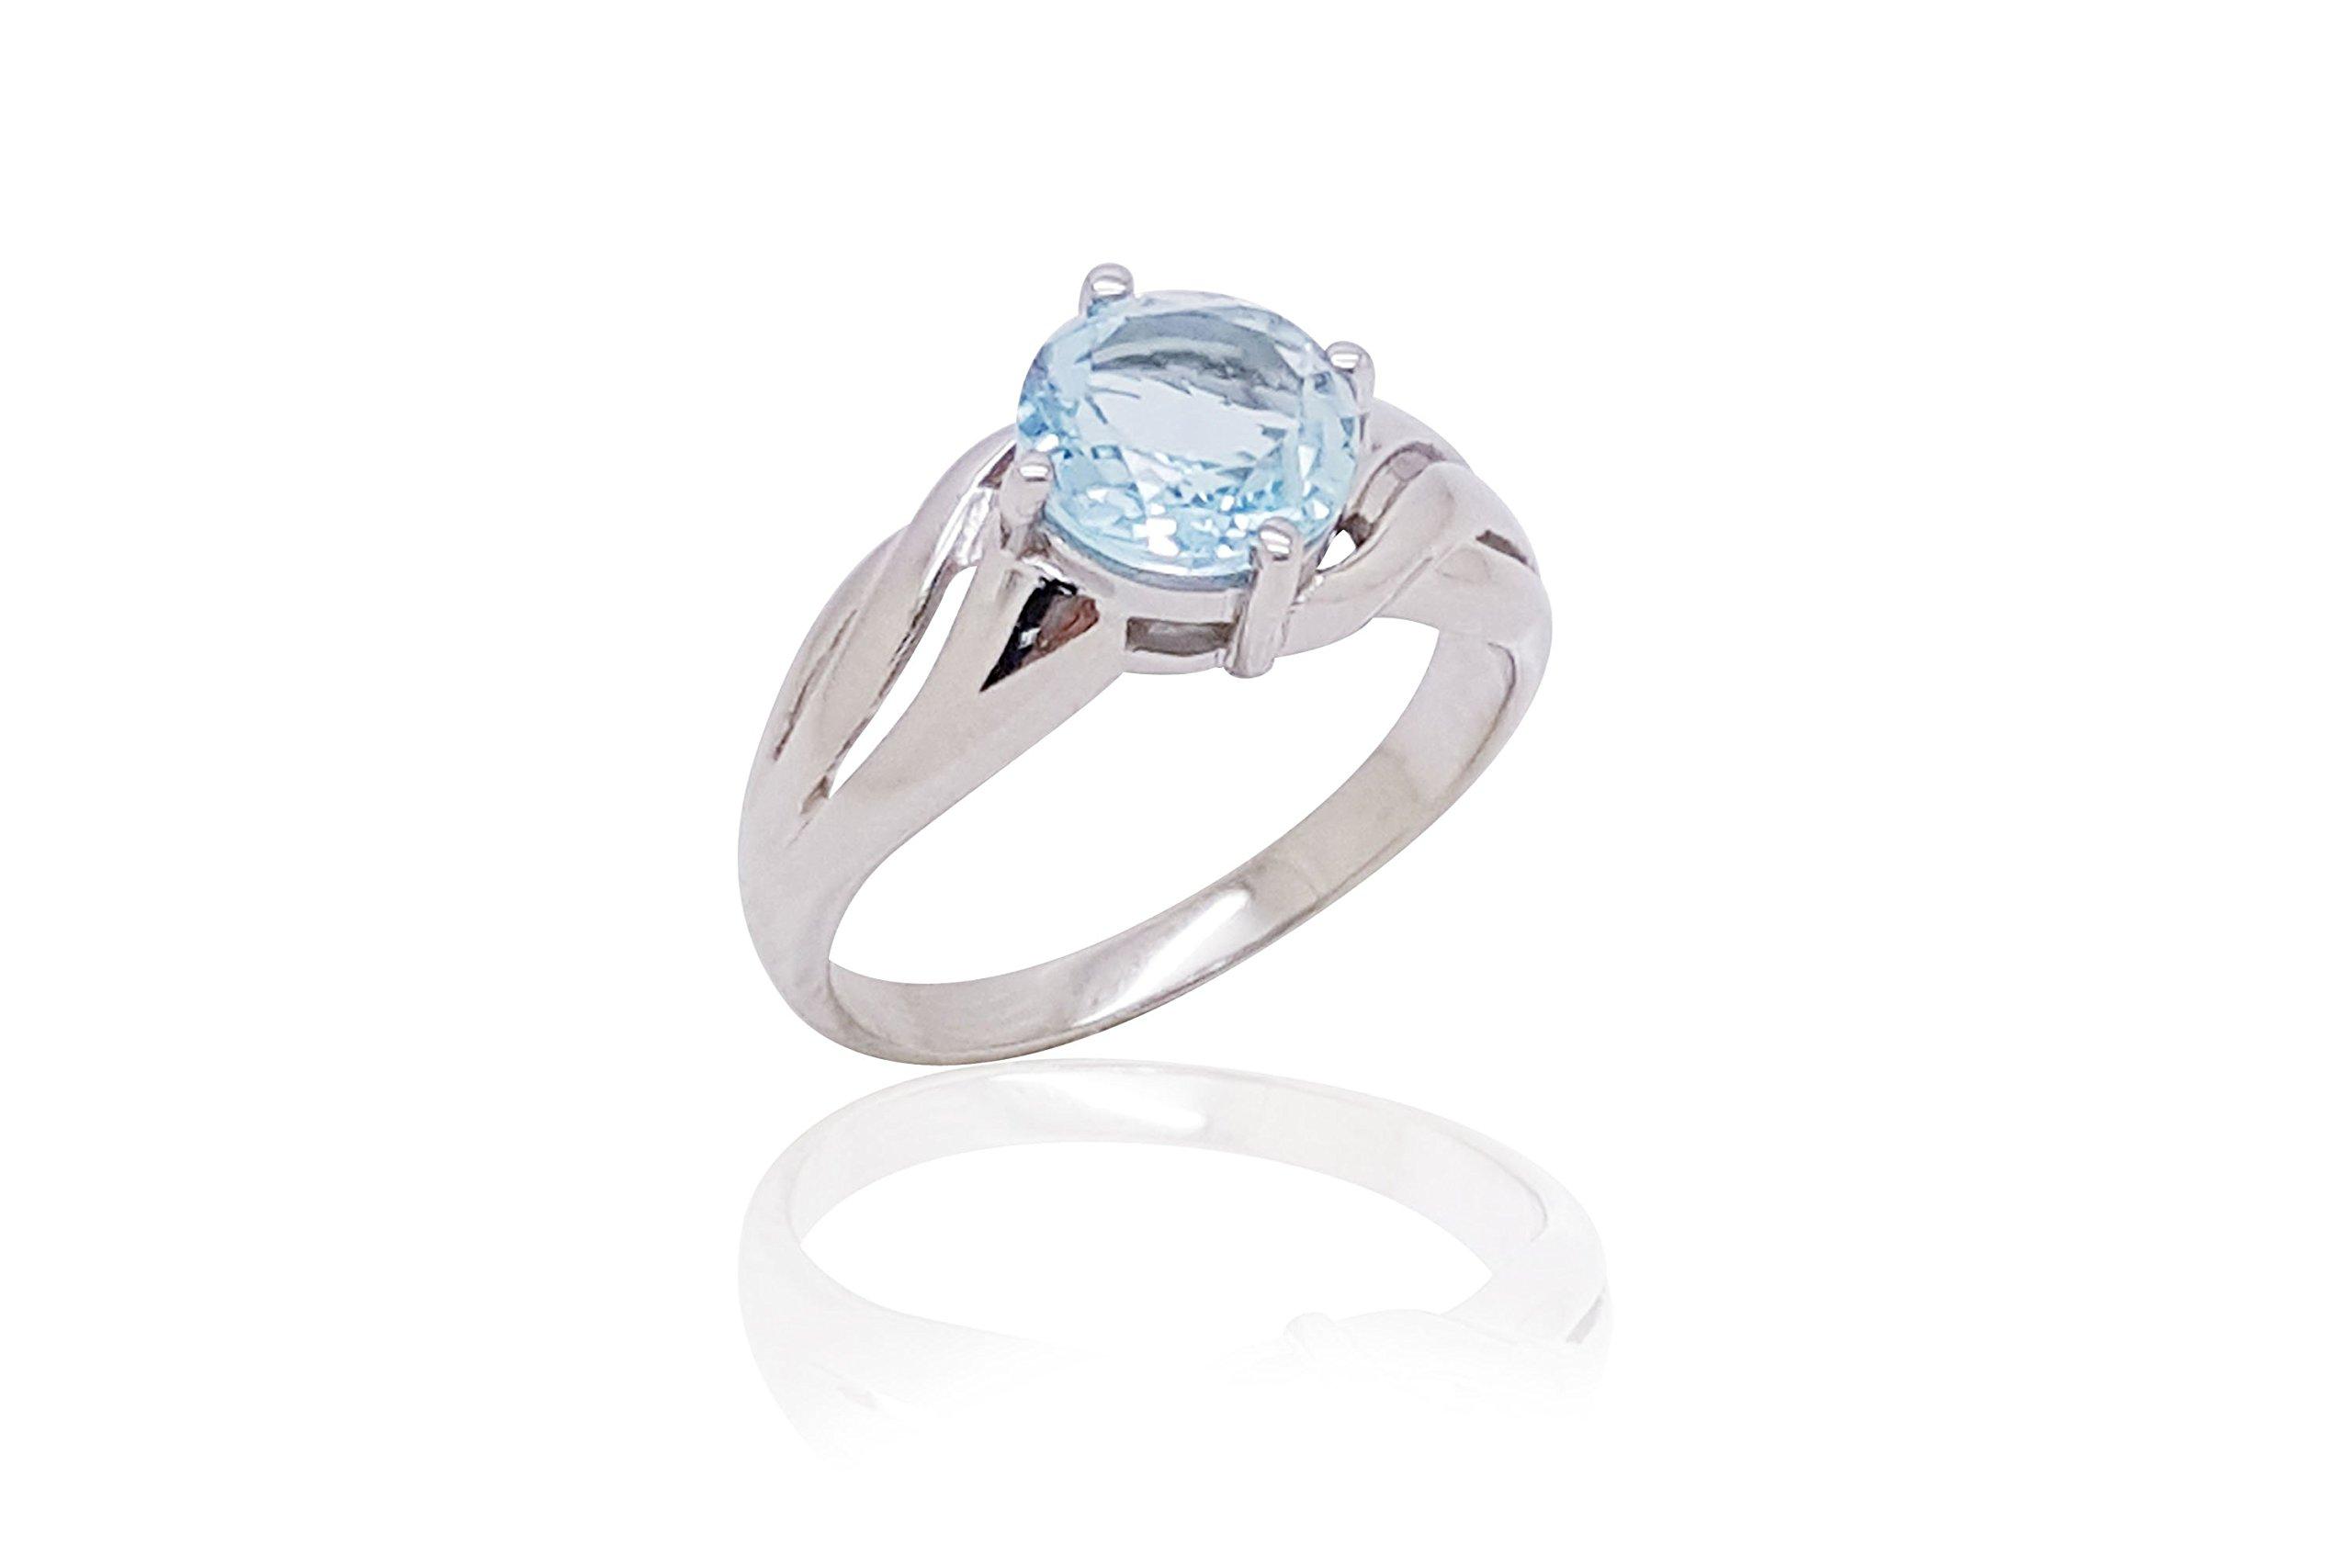 Sparkling Fine Blue Topaz 925 Sterling Silver Ring (10)